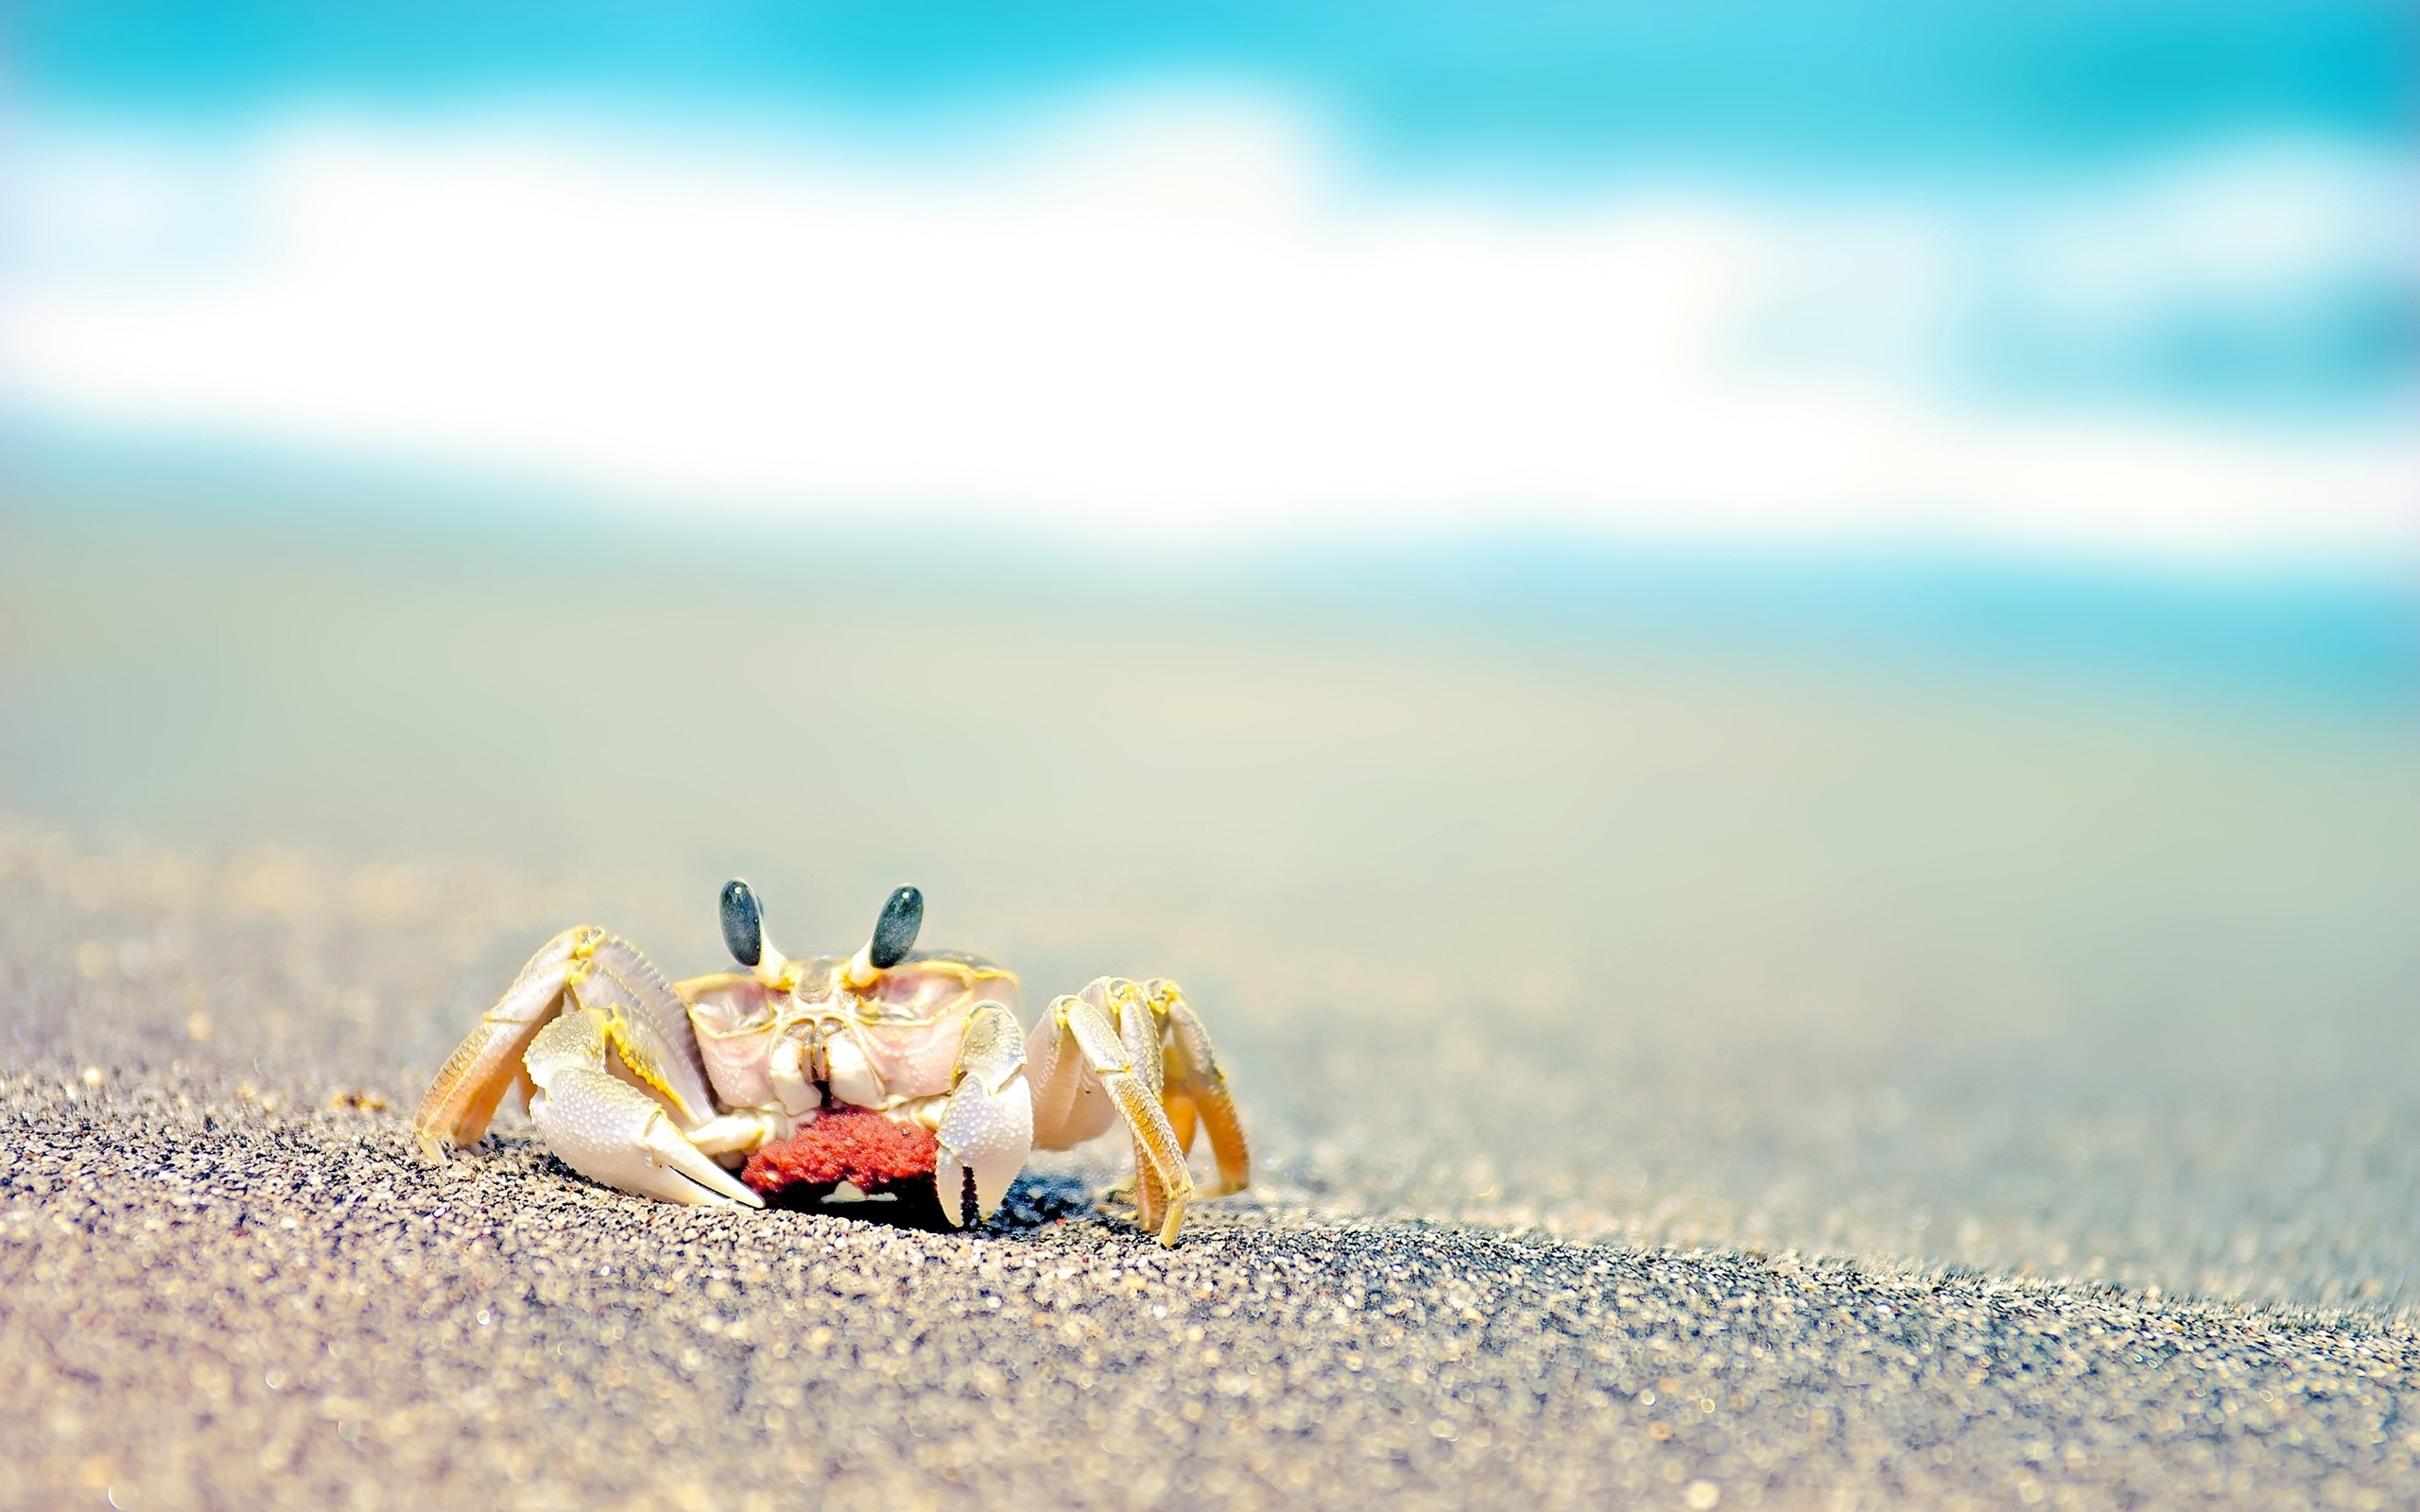 Crab Sand Wave 2560x1600